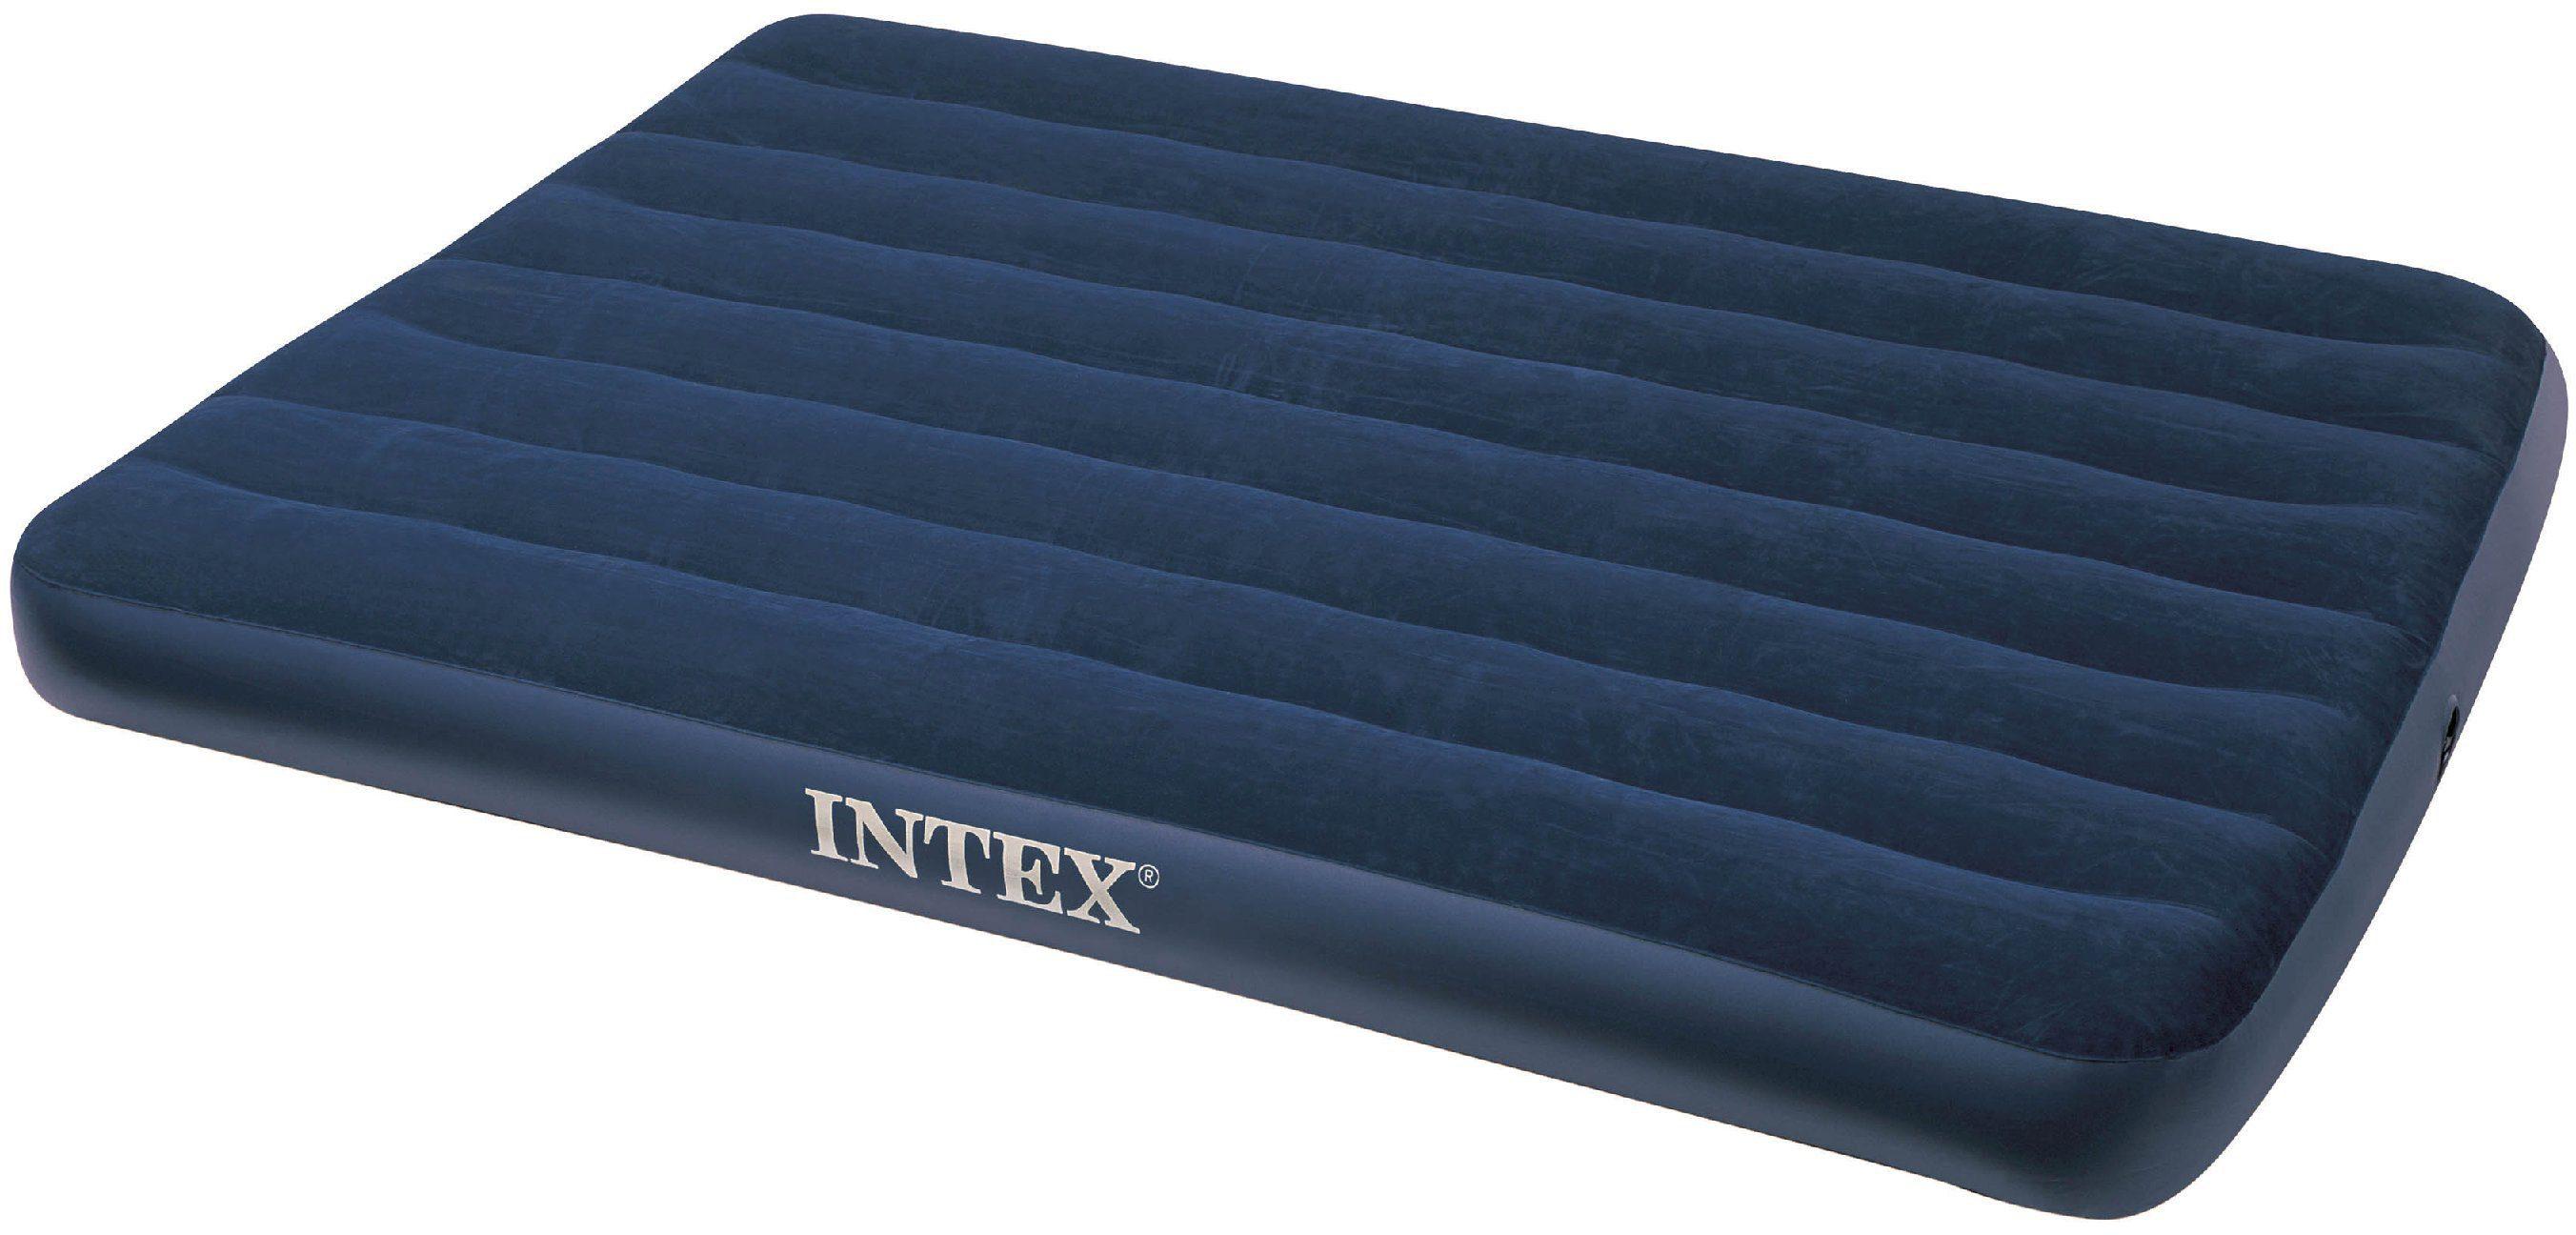 Intex Luftbett, »Classic Downy«